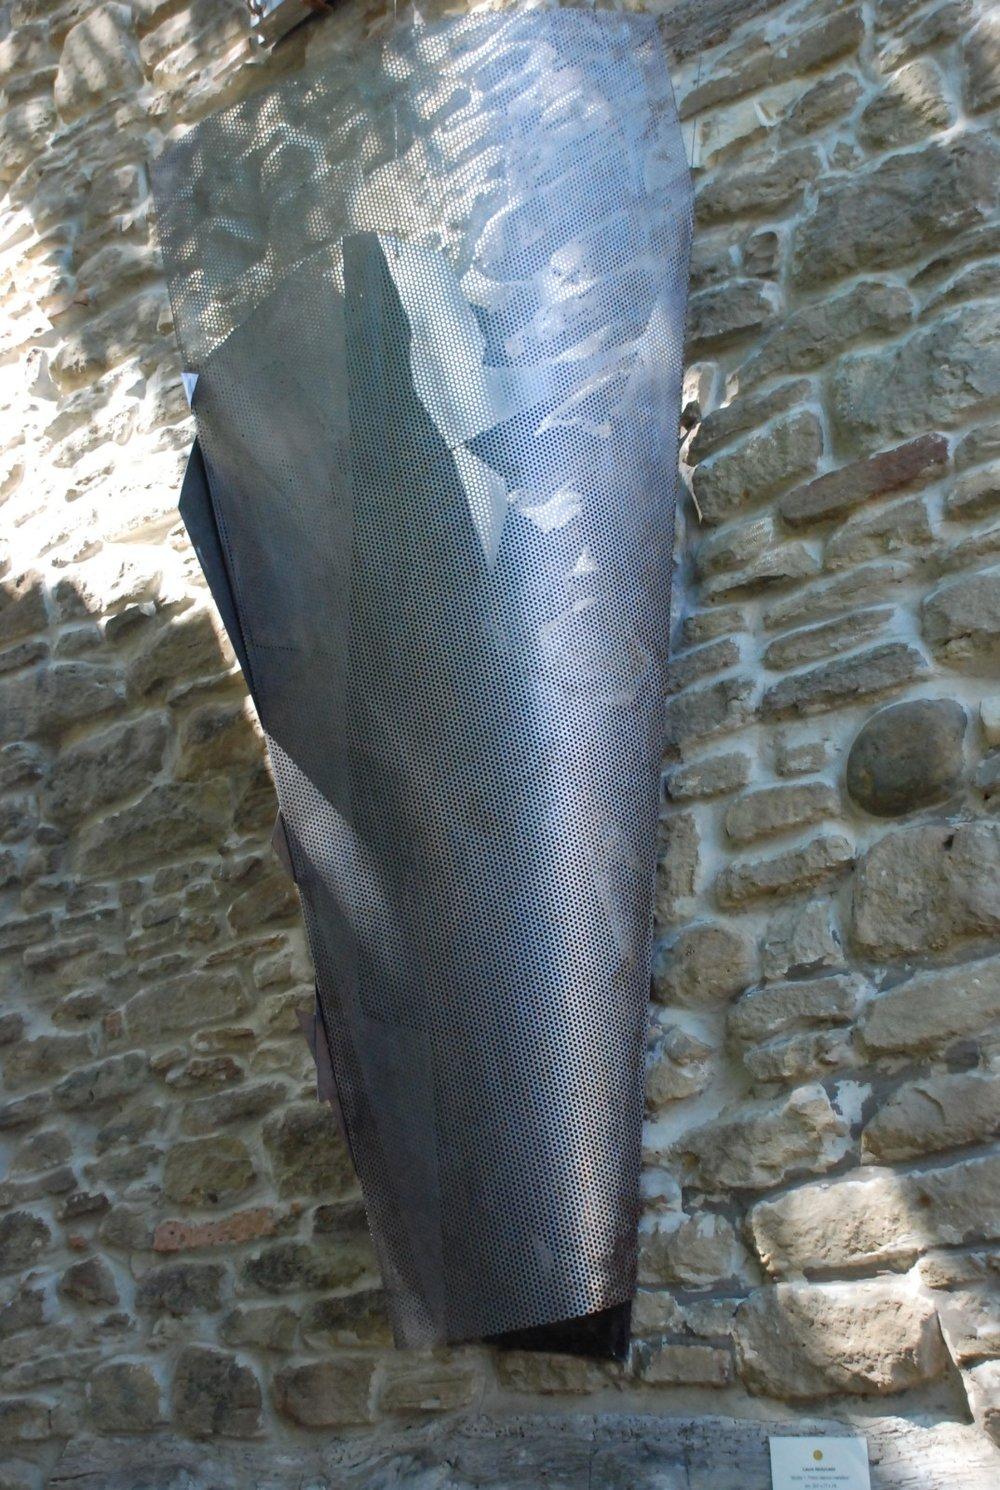 Kayak, Metal sculpture, Arnaldo Pomodoro, art in residence, Pietrarubbia, Italy